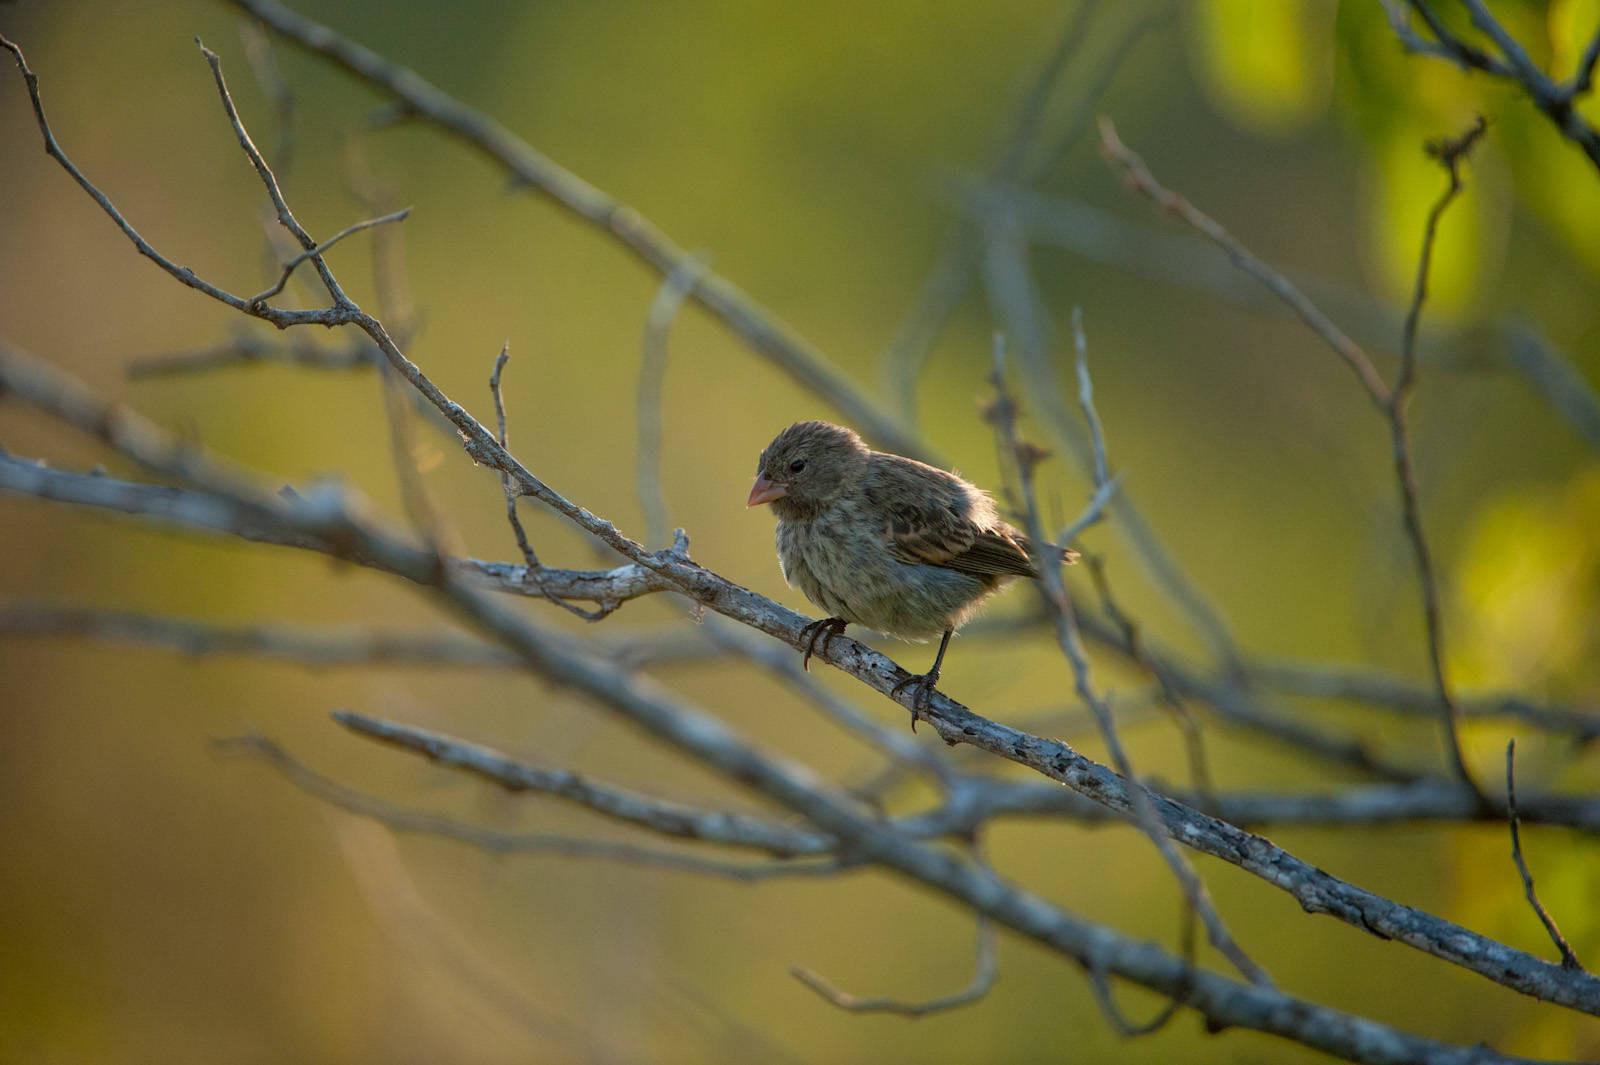 Photo: A female small ground finch (Geospiza fuliginosa) on Rabida Island in Galapagos National Park.